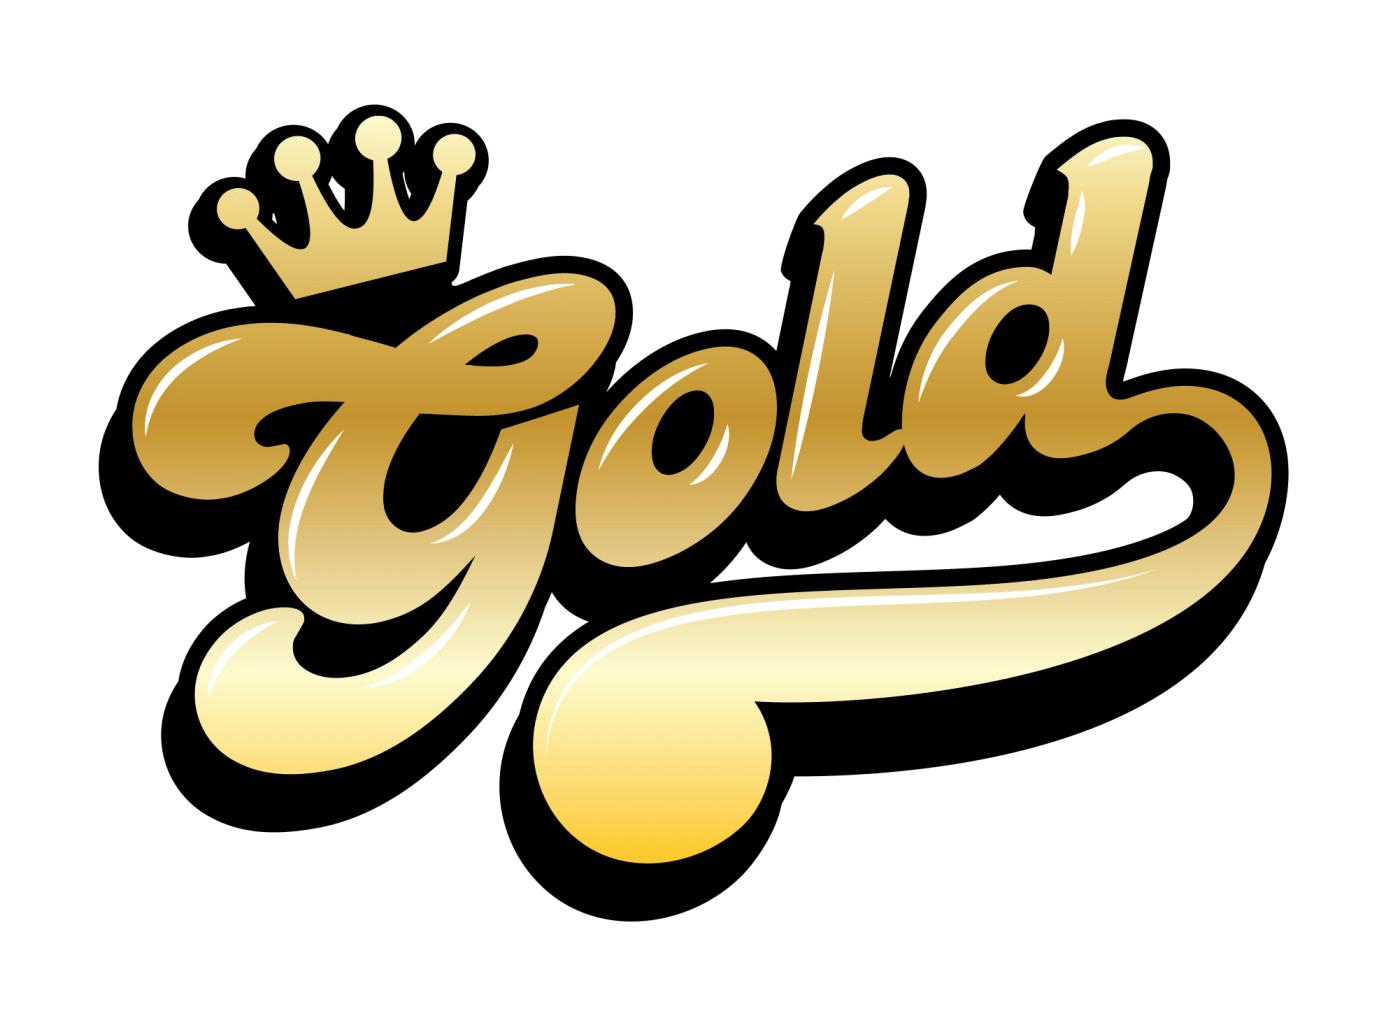 Funko Gold logo